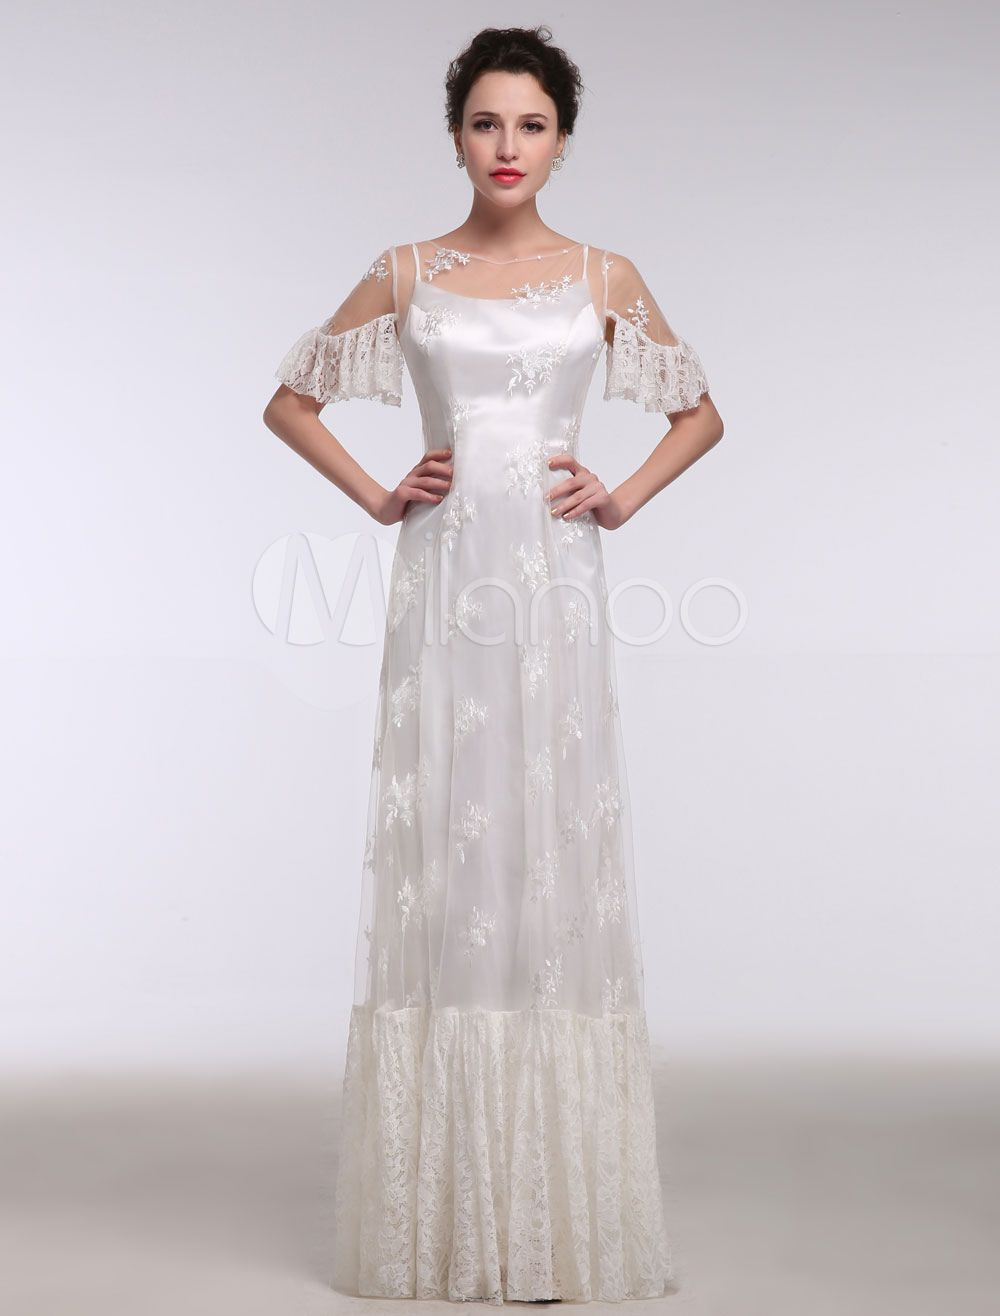 Bridal gowns for beach weddings  Summer Wedding Dresses  Boho Beach Lace Illusion Ruffle Short